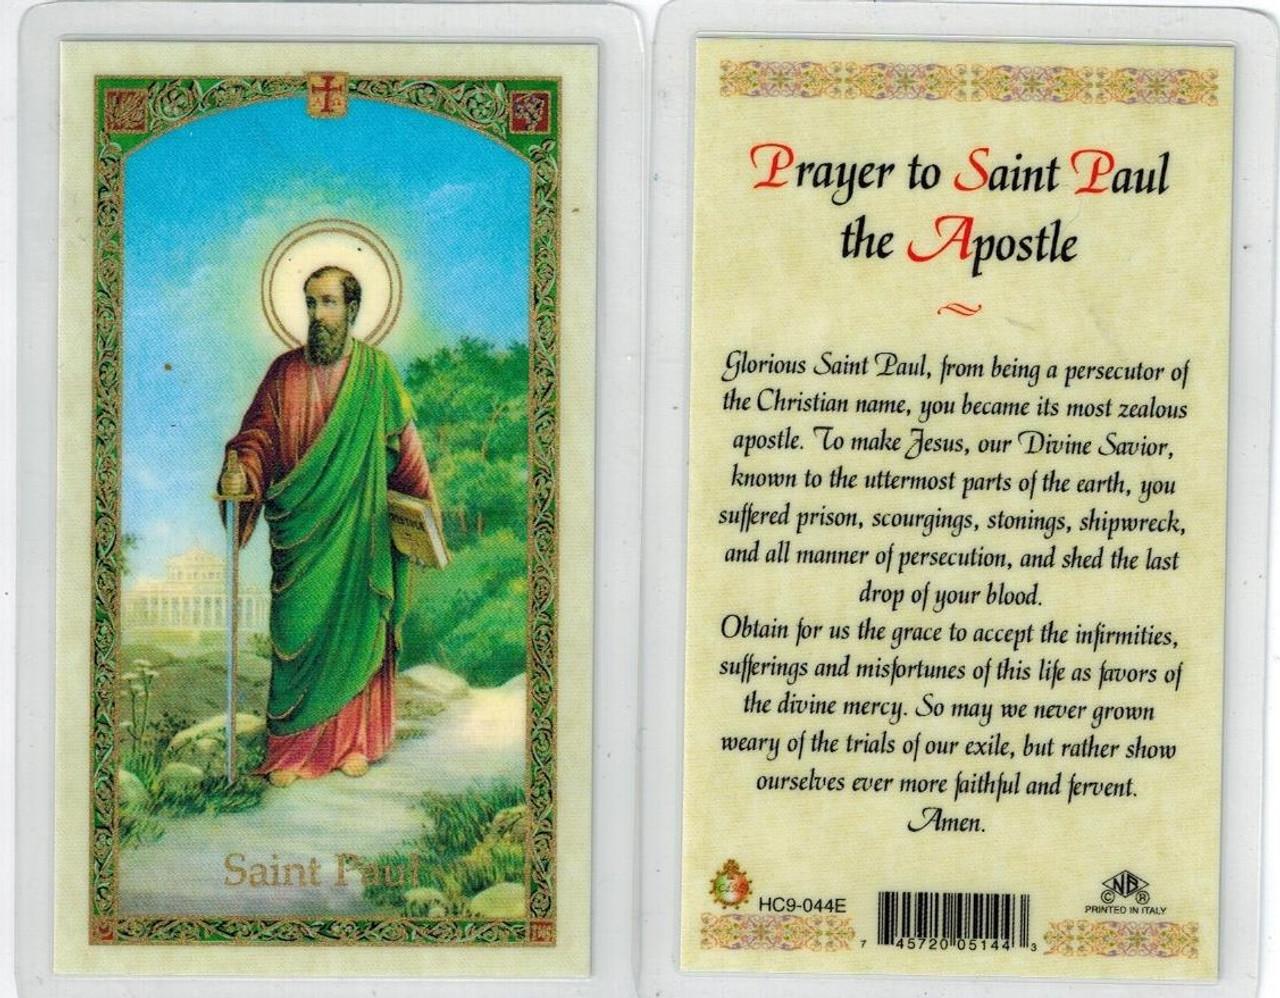 Prayer to St. Paul the Apostle, laminated prayer card